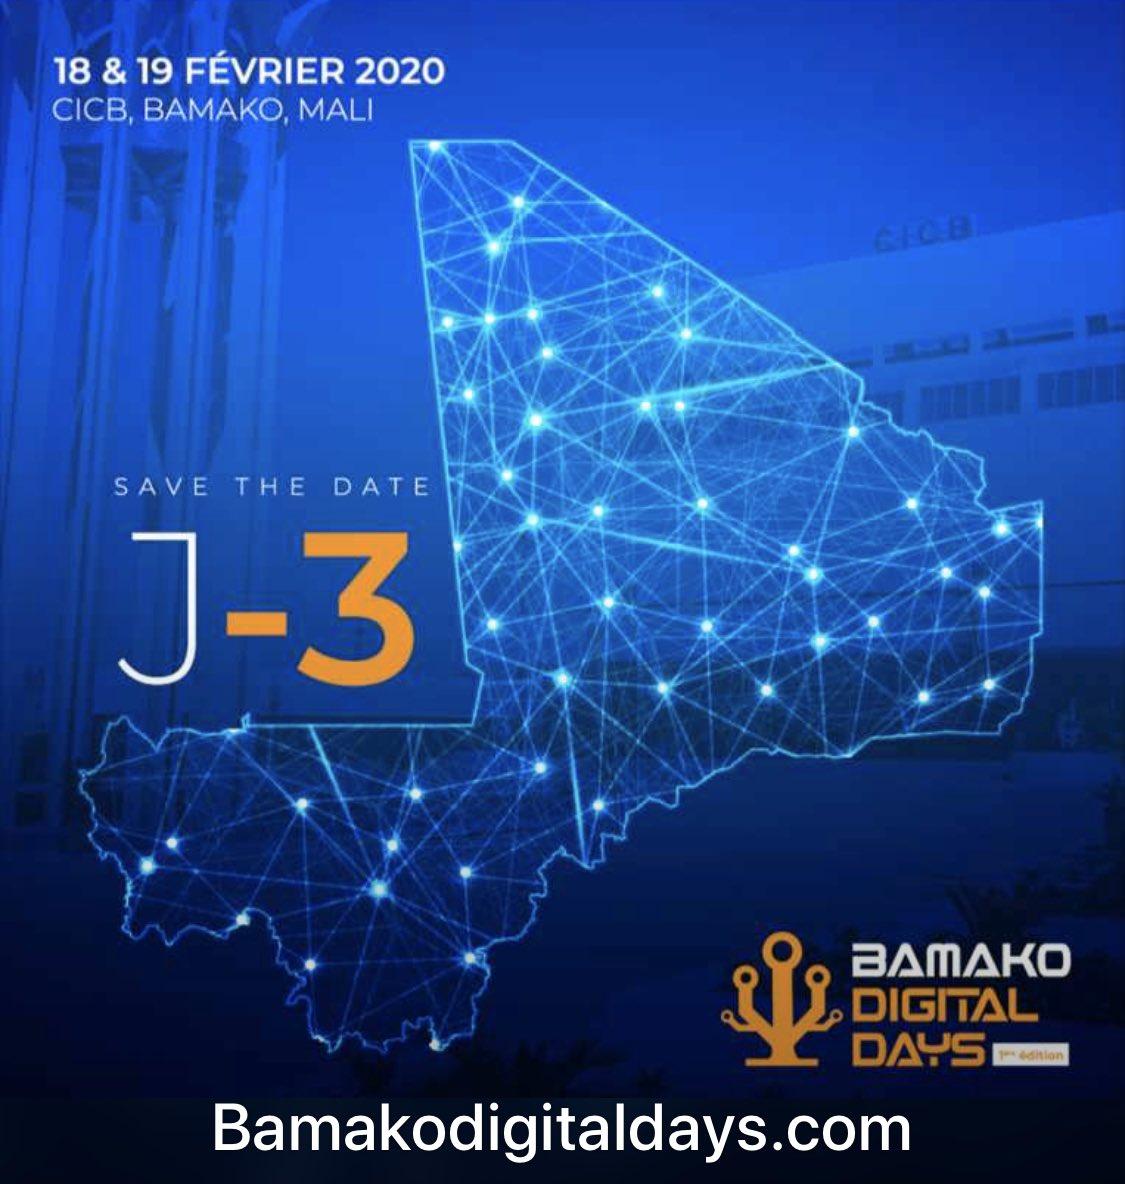 http://kinguievent.com/vote.php?id=MQ%3D%3D&fbclid=IwAR3QW1NdeY7xa_HmoEyqG0fZAy4aA99CPRkL3dyNjOTOsOcHlyVmjlGi3Bs…